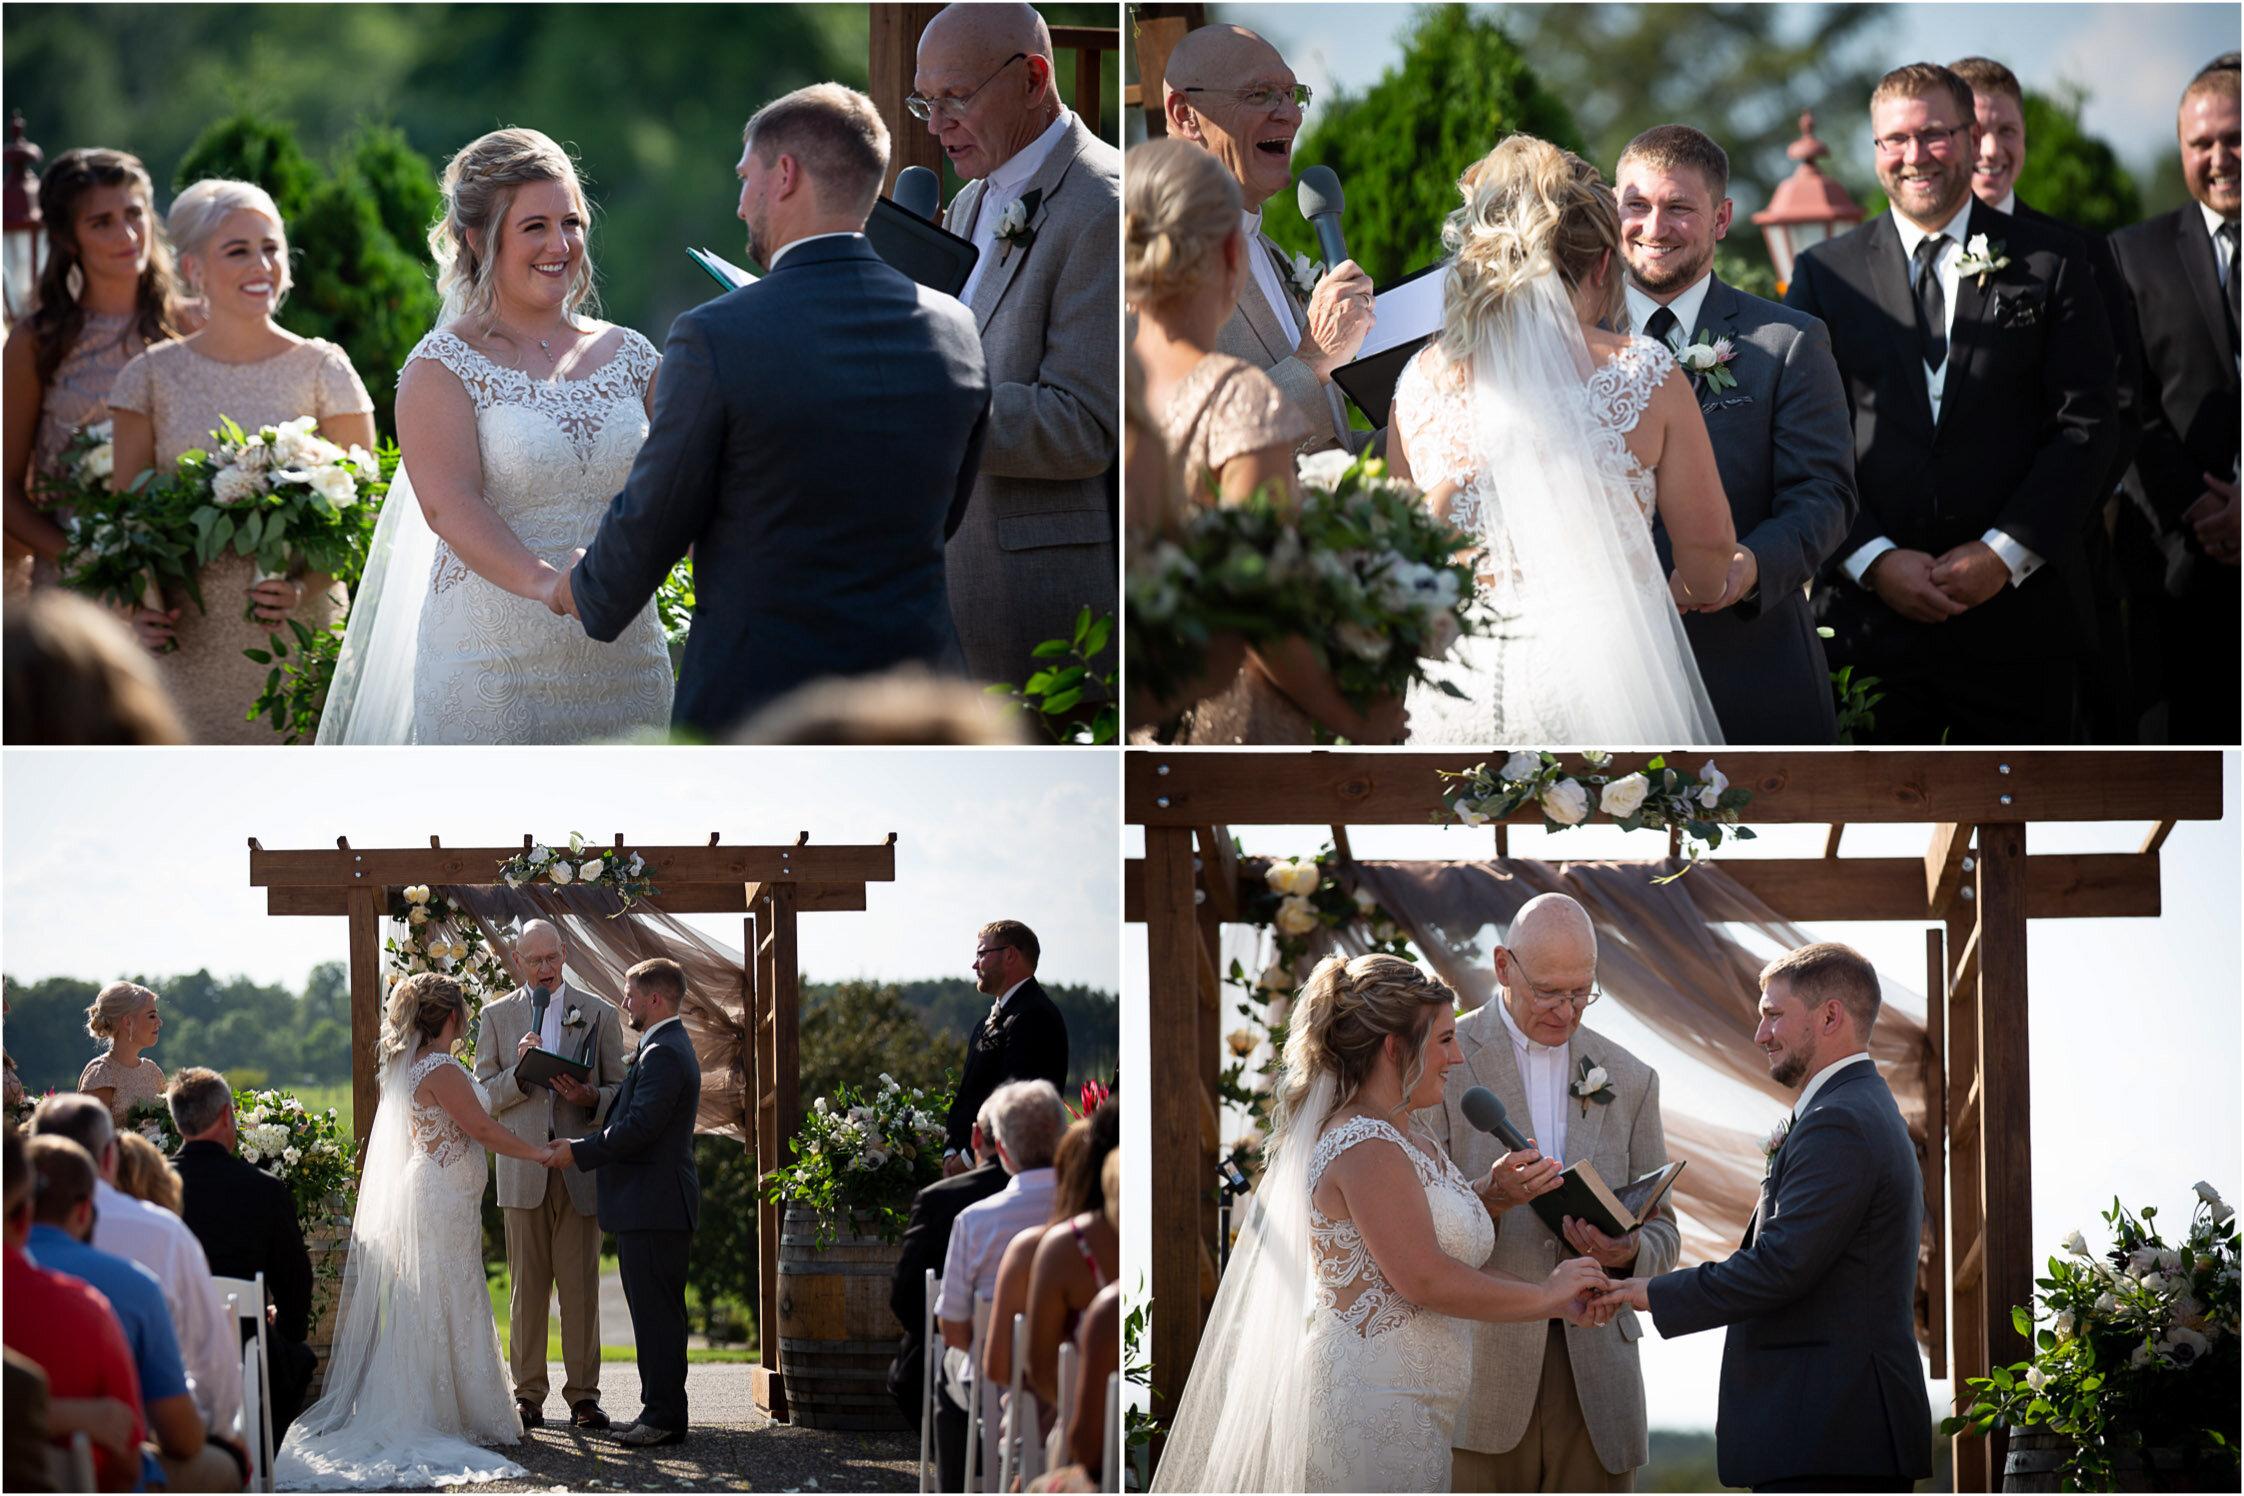 22-rush-creek-golf-course-outdoor-ceremony-arbor-vows-mahonenphotography-mn-wedding-photographer.jpg